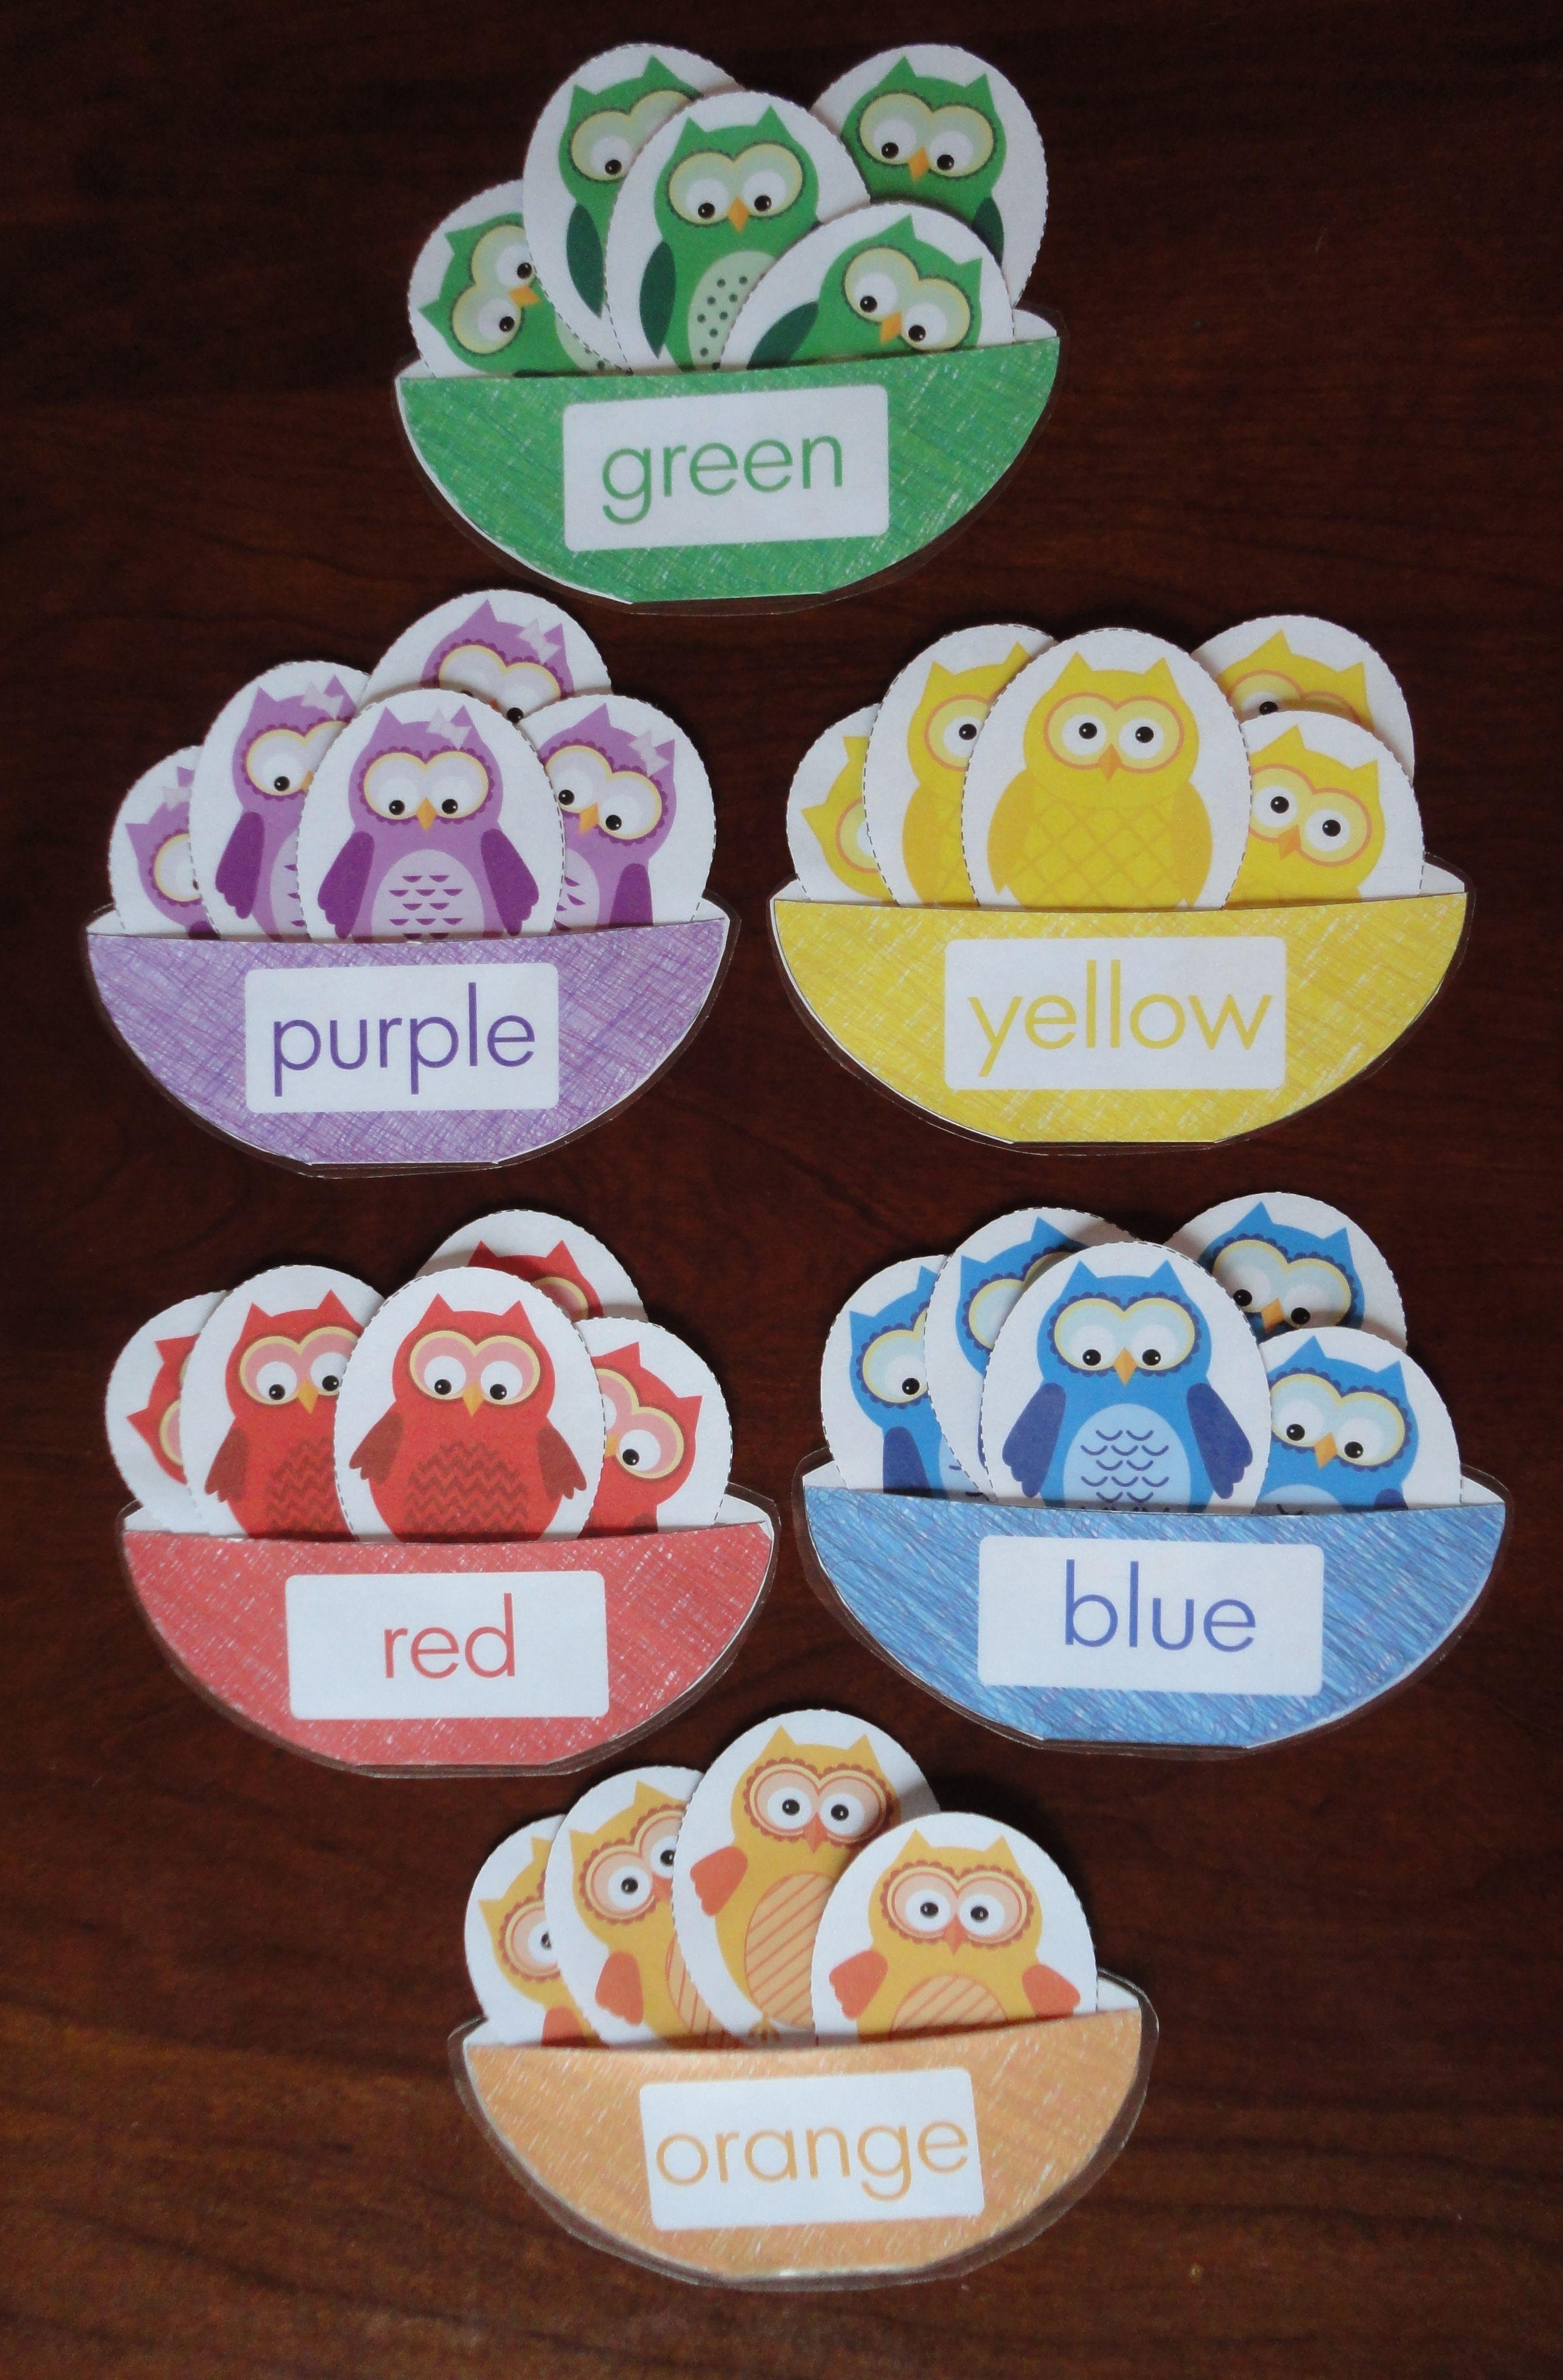 color match size sorting owls preschool themes teaching colors preschool activities. Black Bedroom Furniture Sets. Home Design Ideas